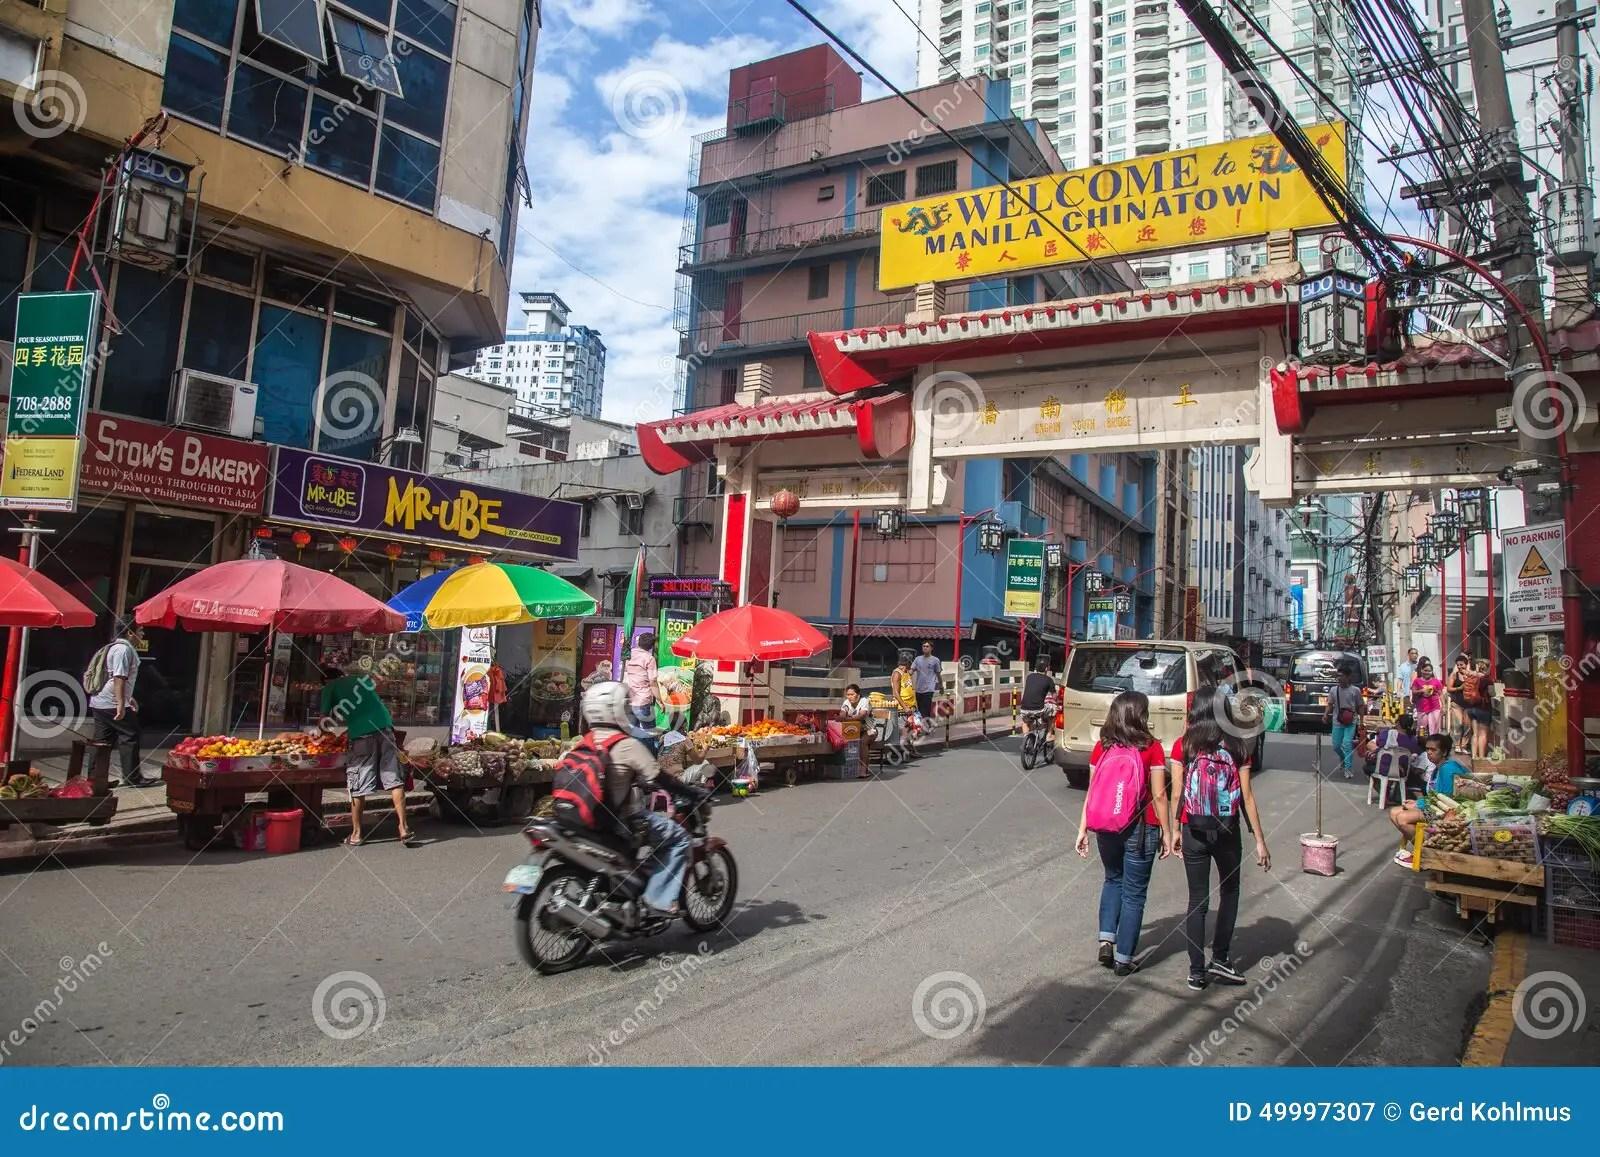 Chinatown Manila Editorial Photography Image 49997307